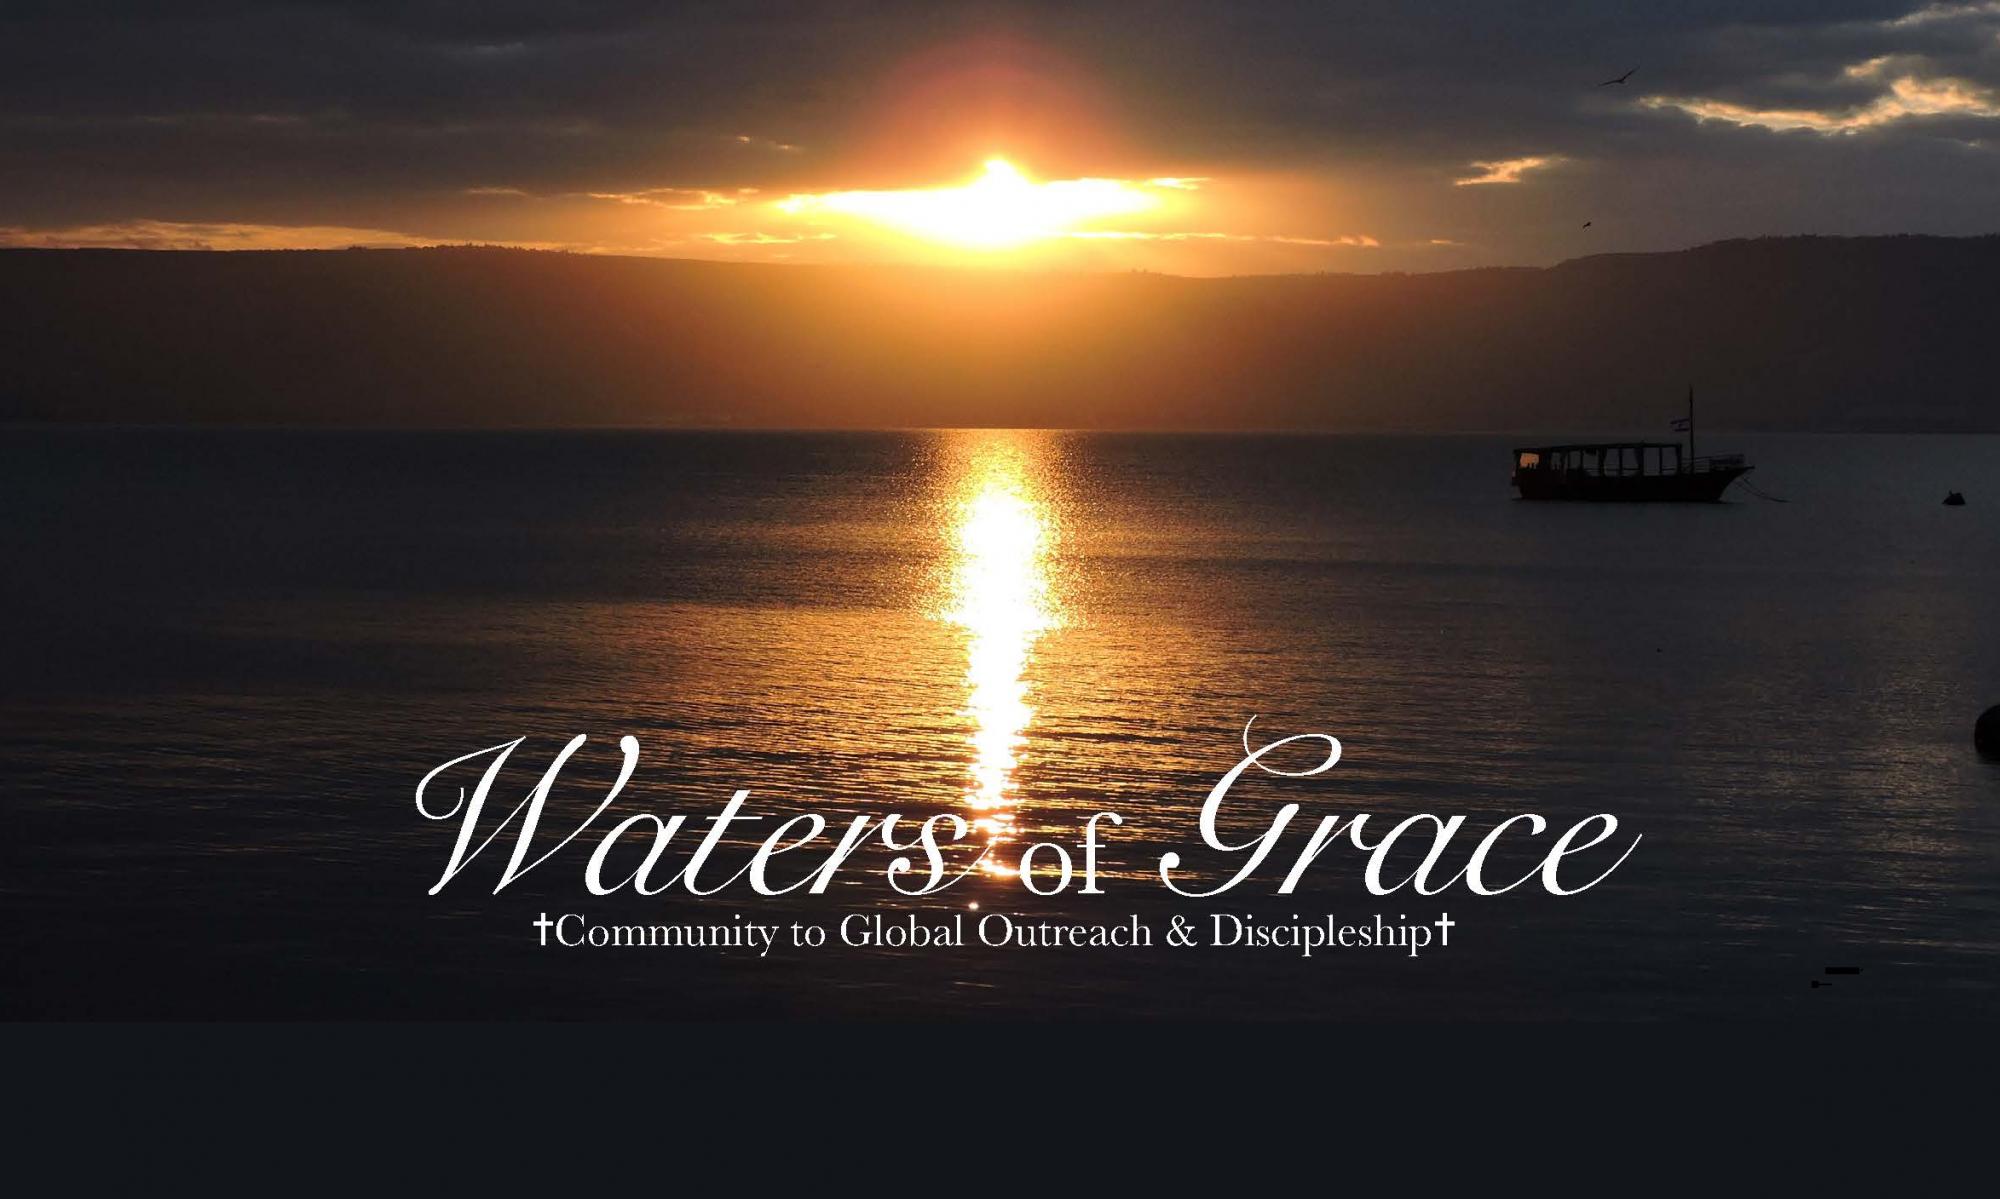 Waters of Grace